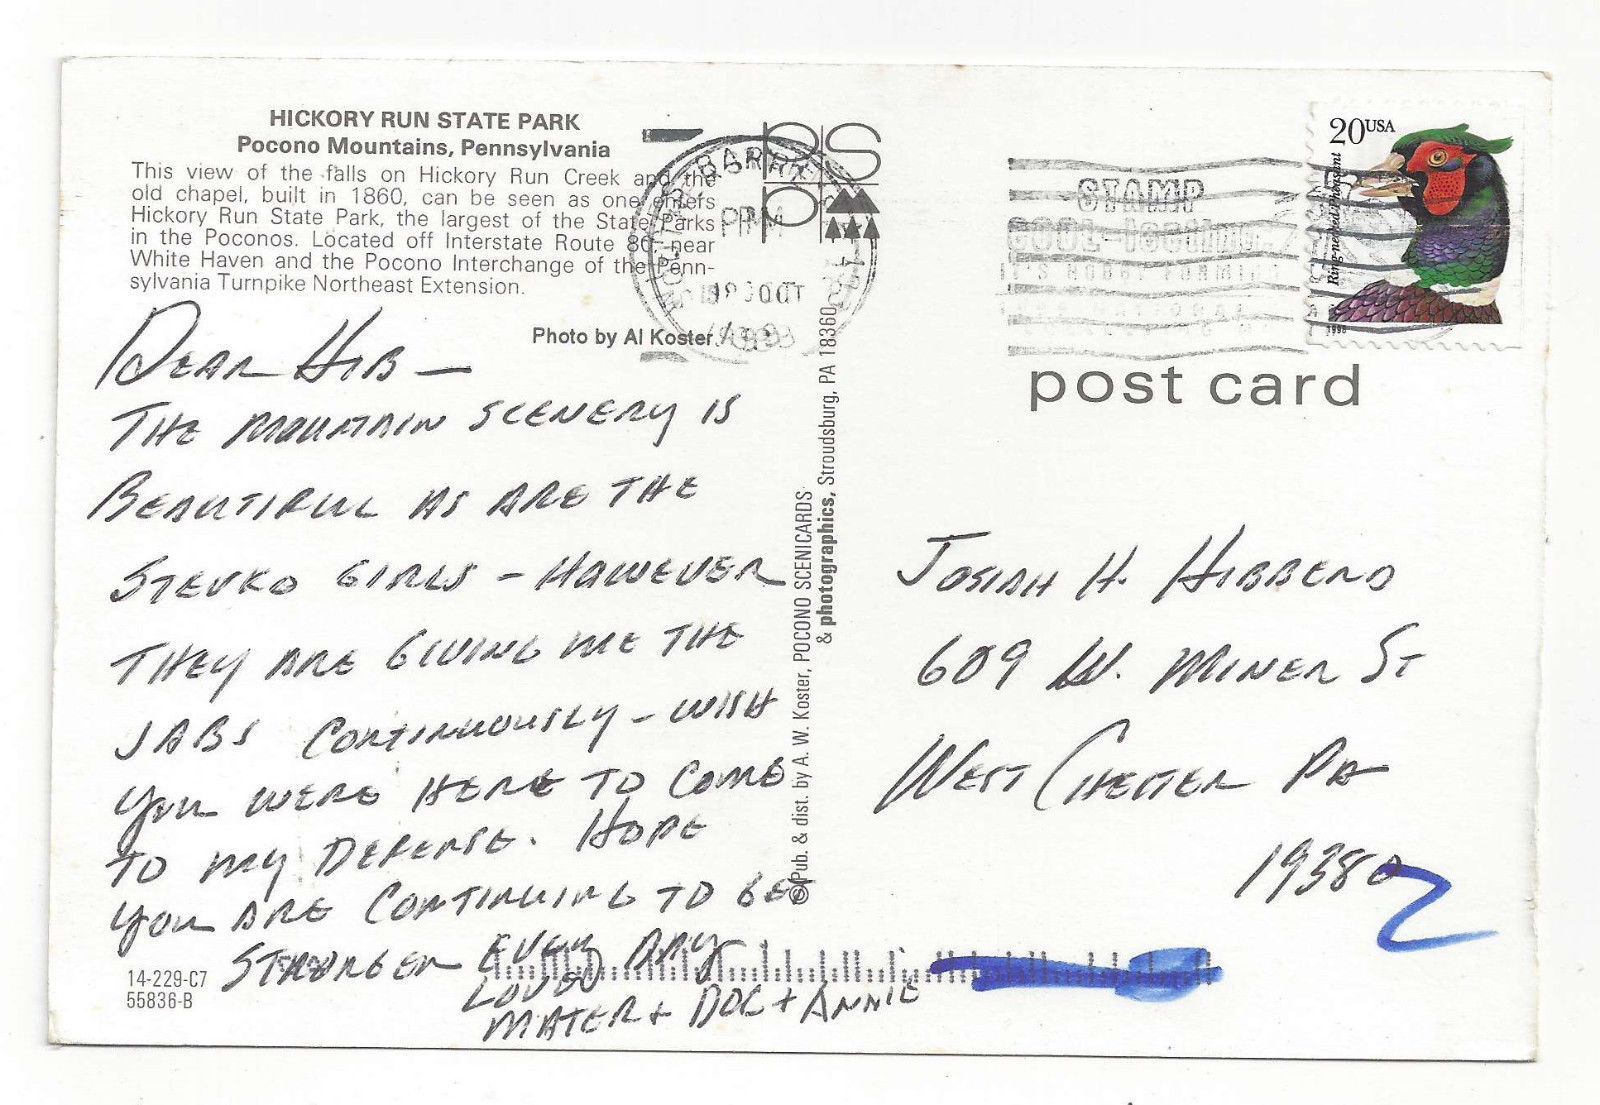 PA Pocono Mountains Hickory Run State Park Chapel Falls 1999 Postcard 4X6